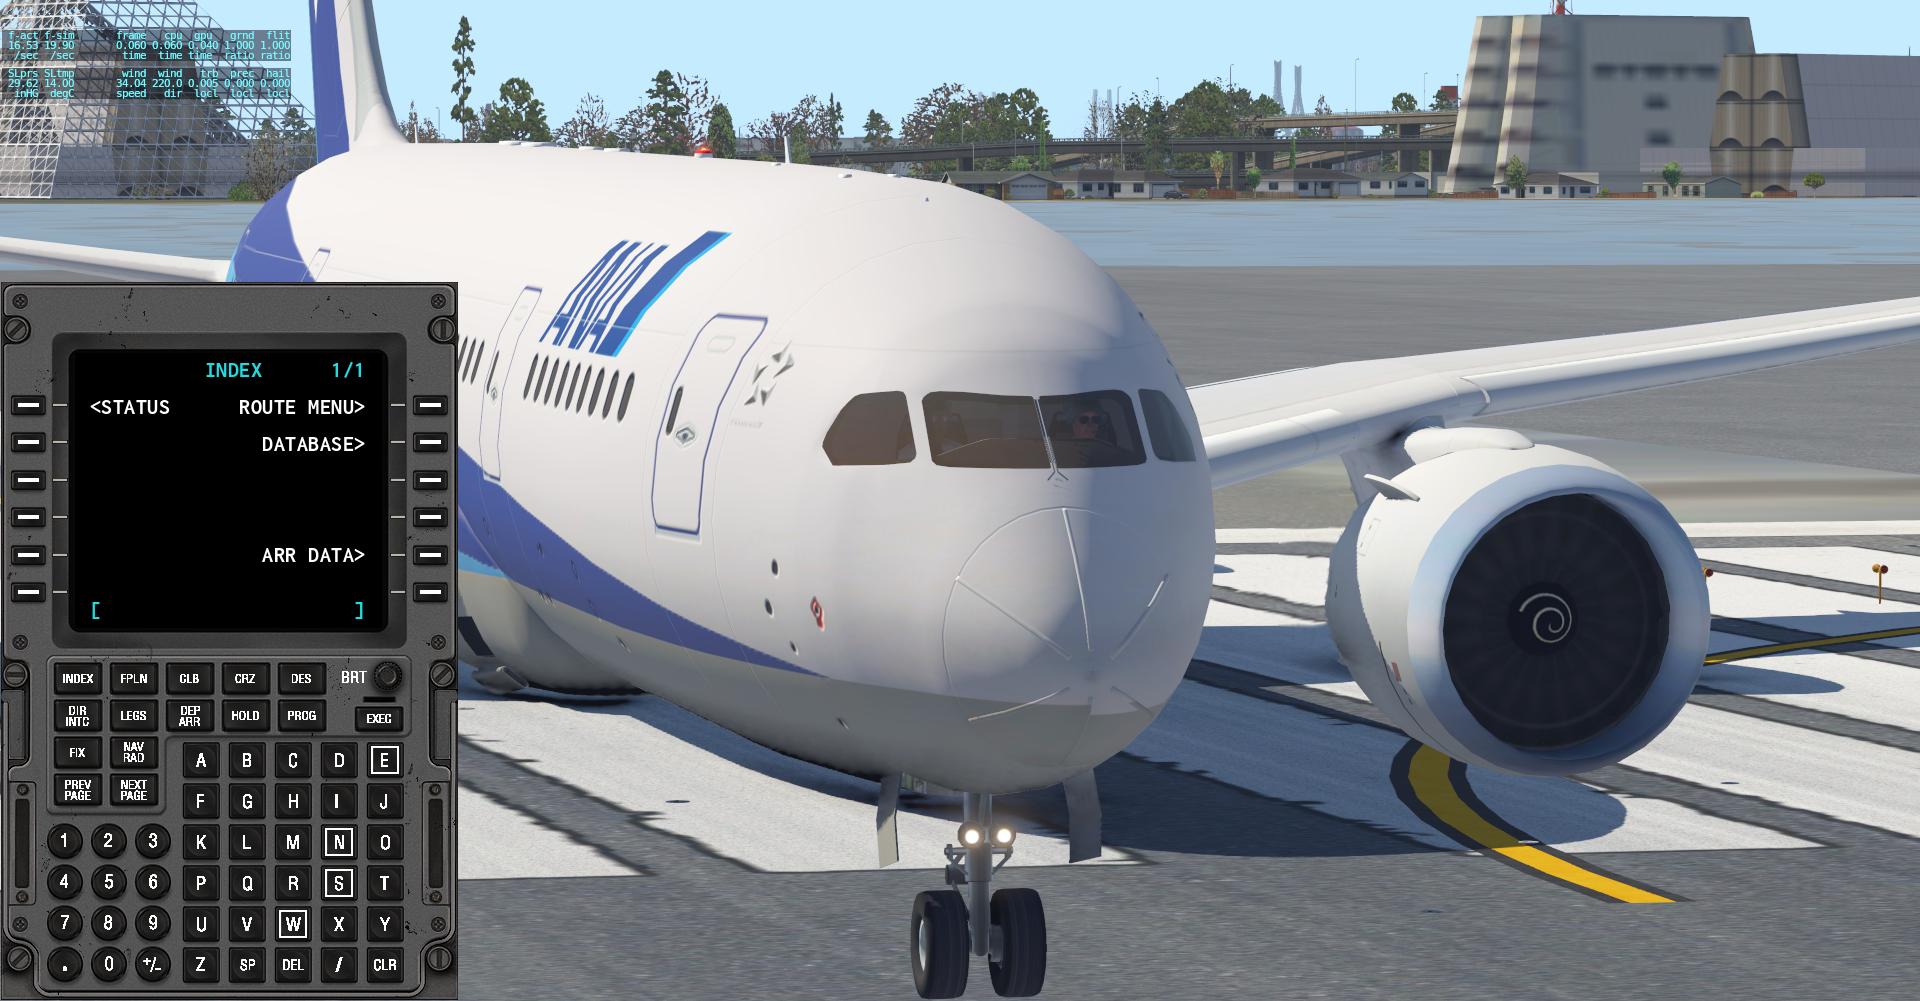 Boeing 787 Dreamliner by Vmax working in xplane 11? - XP11 General